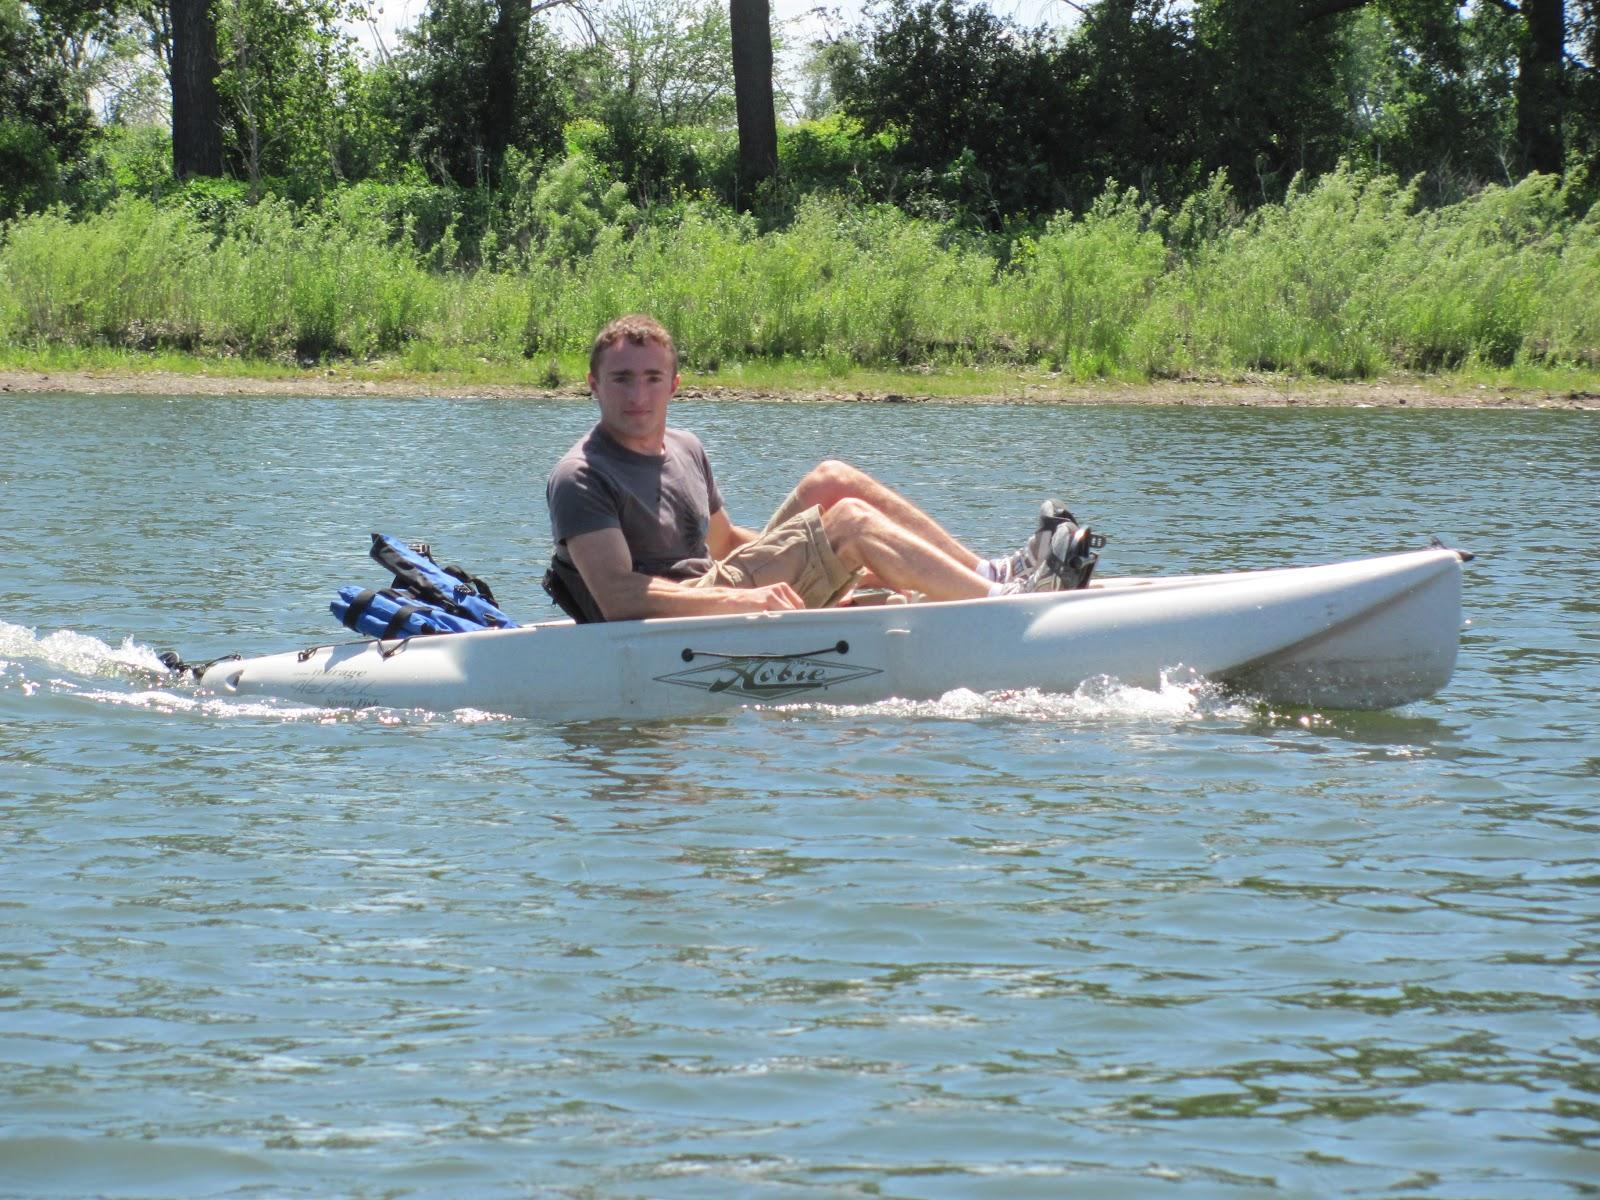 Kayaking the lakes of south dakota sdcka paddling fair for Paddle boat fishing